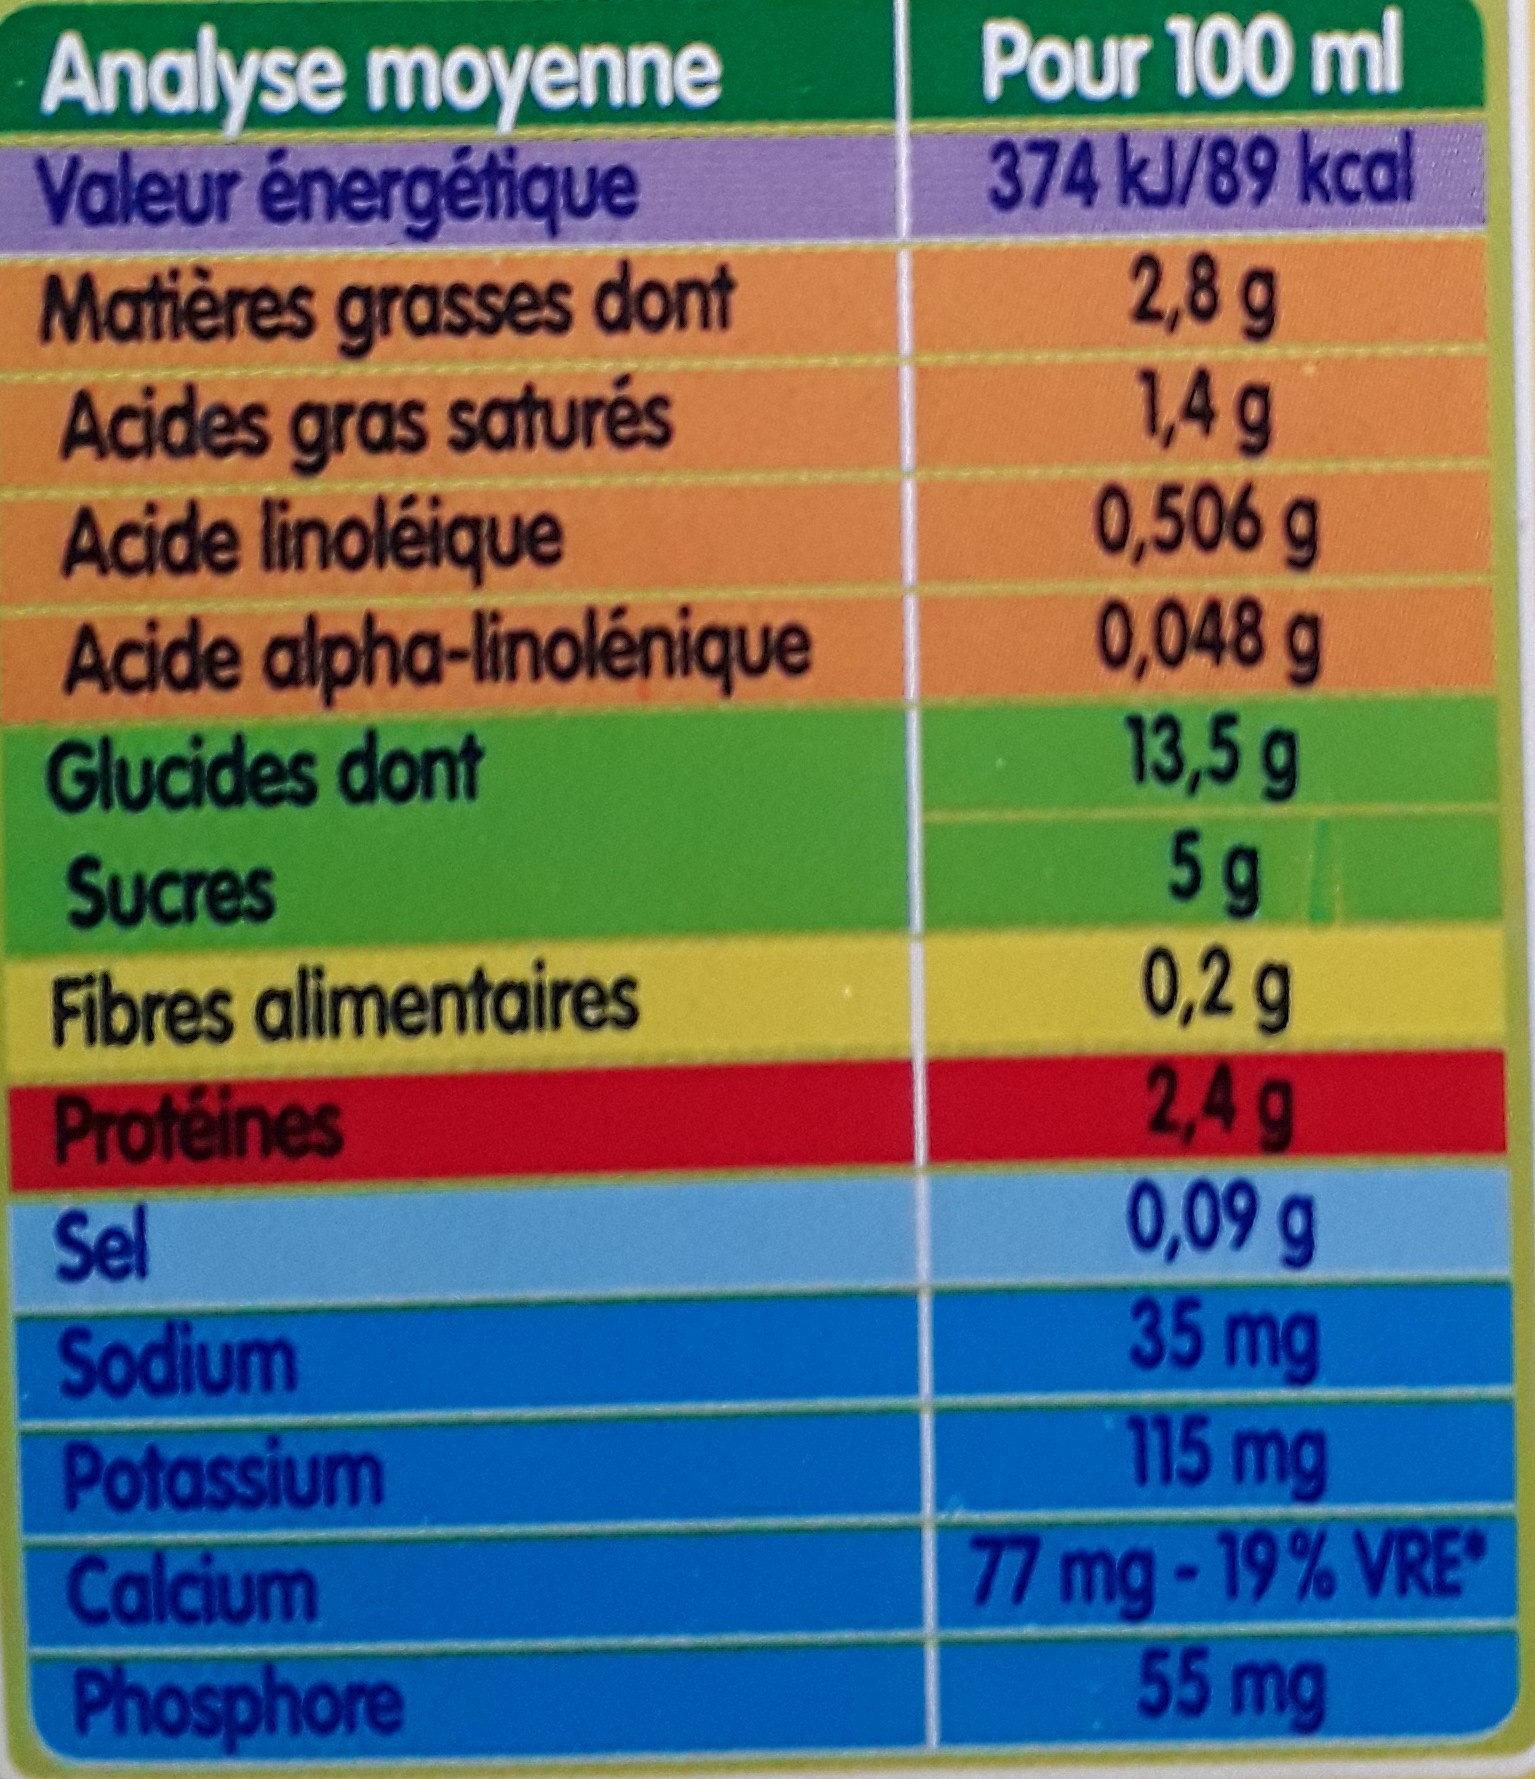 BLEDINA BLEDIDEJ Cacao 4x250ml Dès 6 Mois - Valori nutrizionali - fr